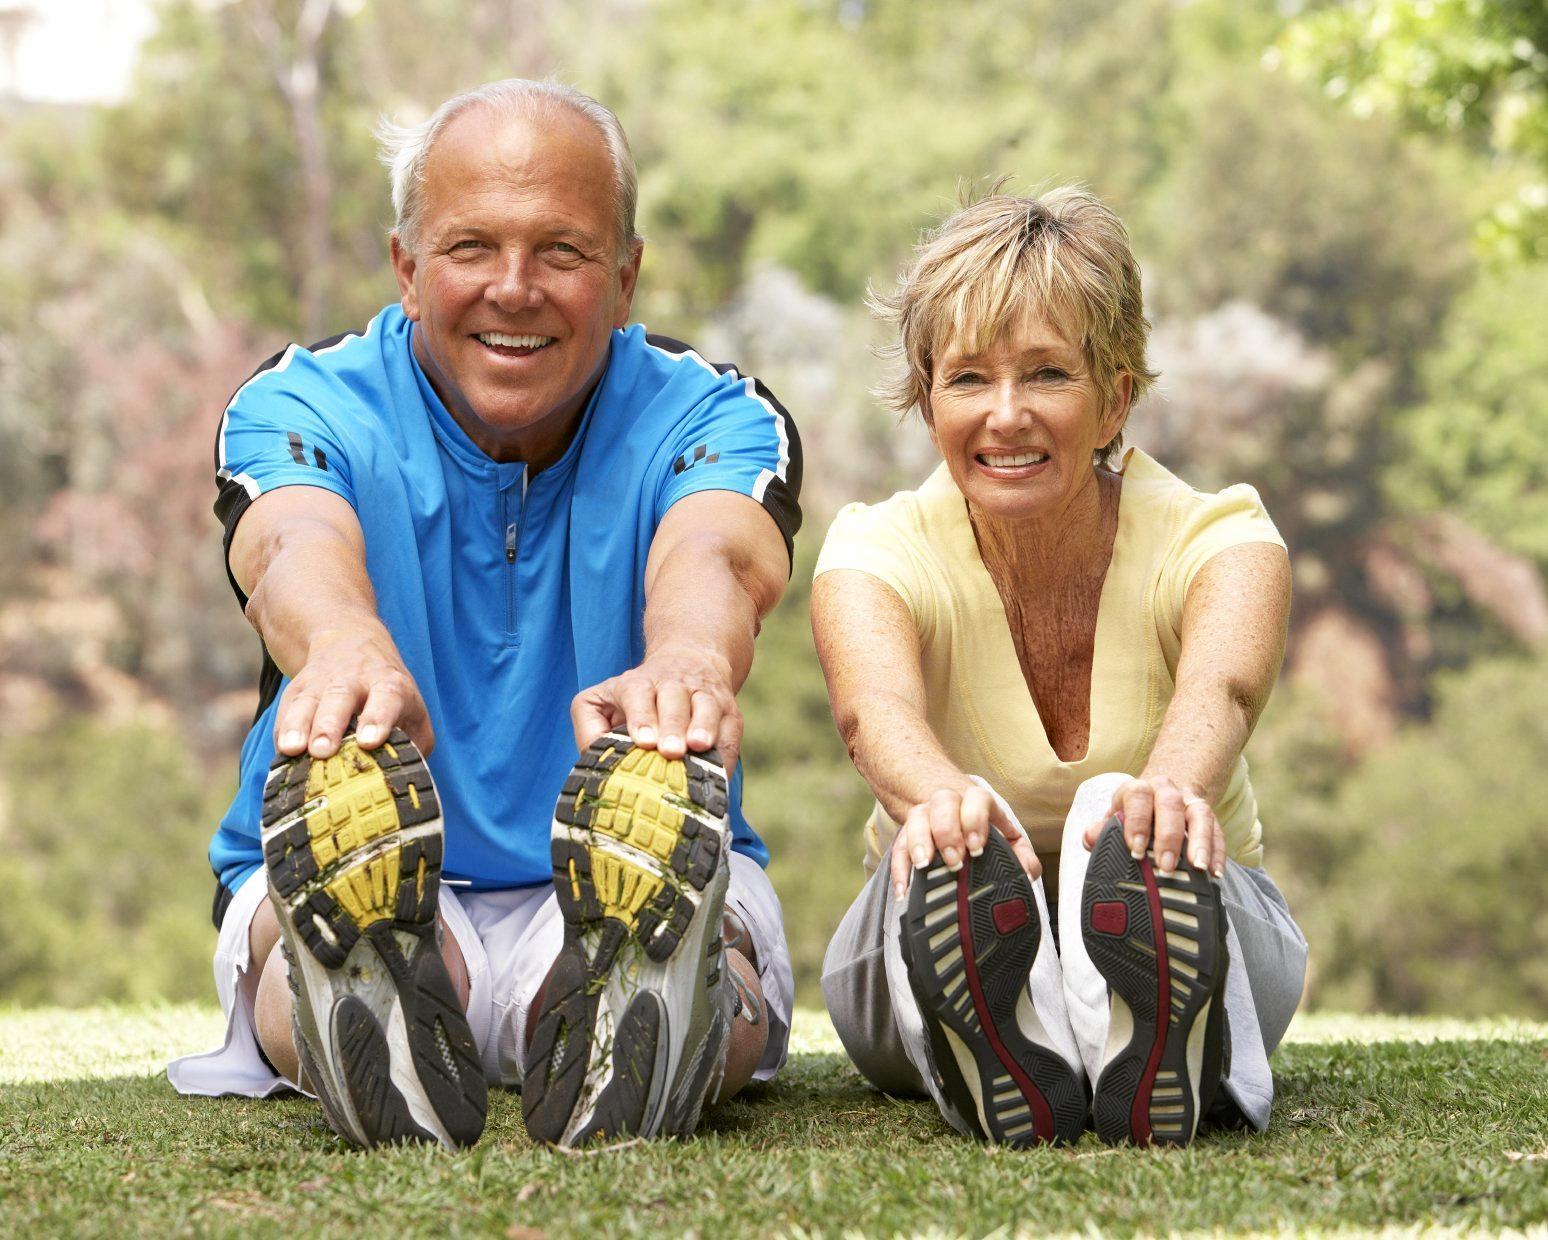 Regain flexibility with yoga classes.